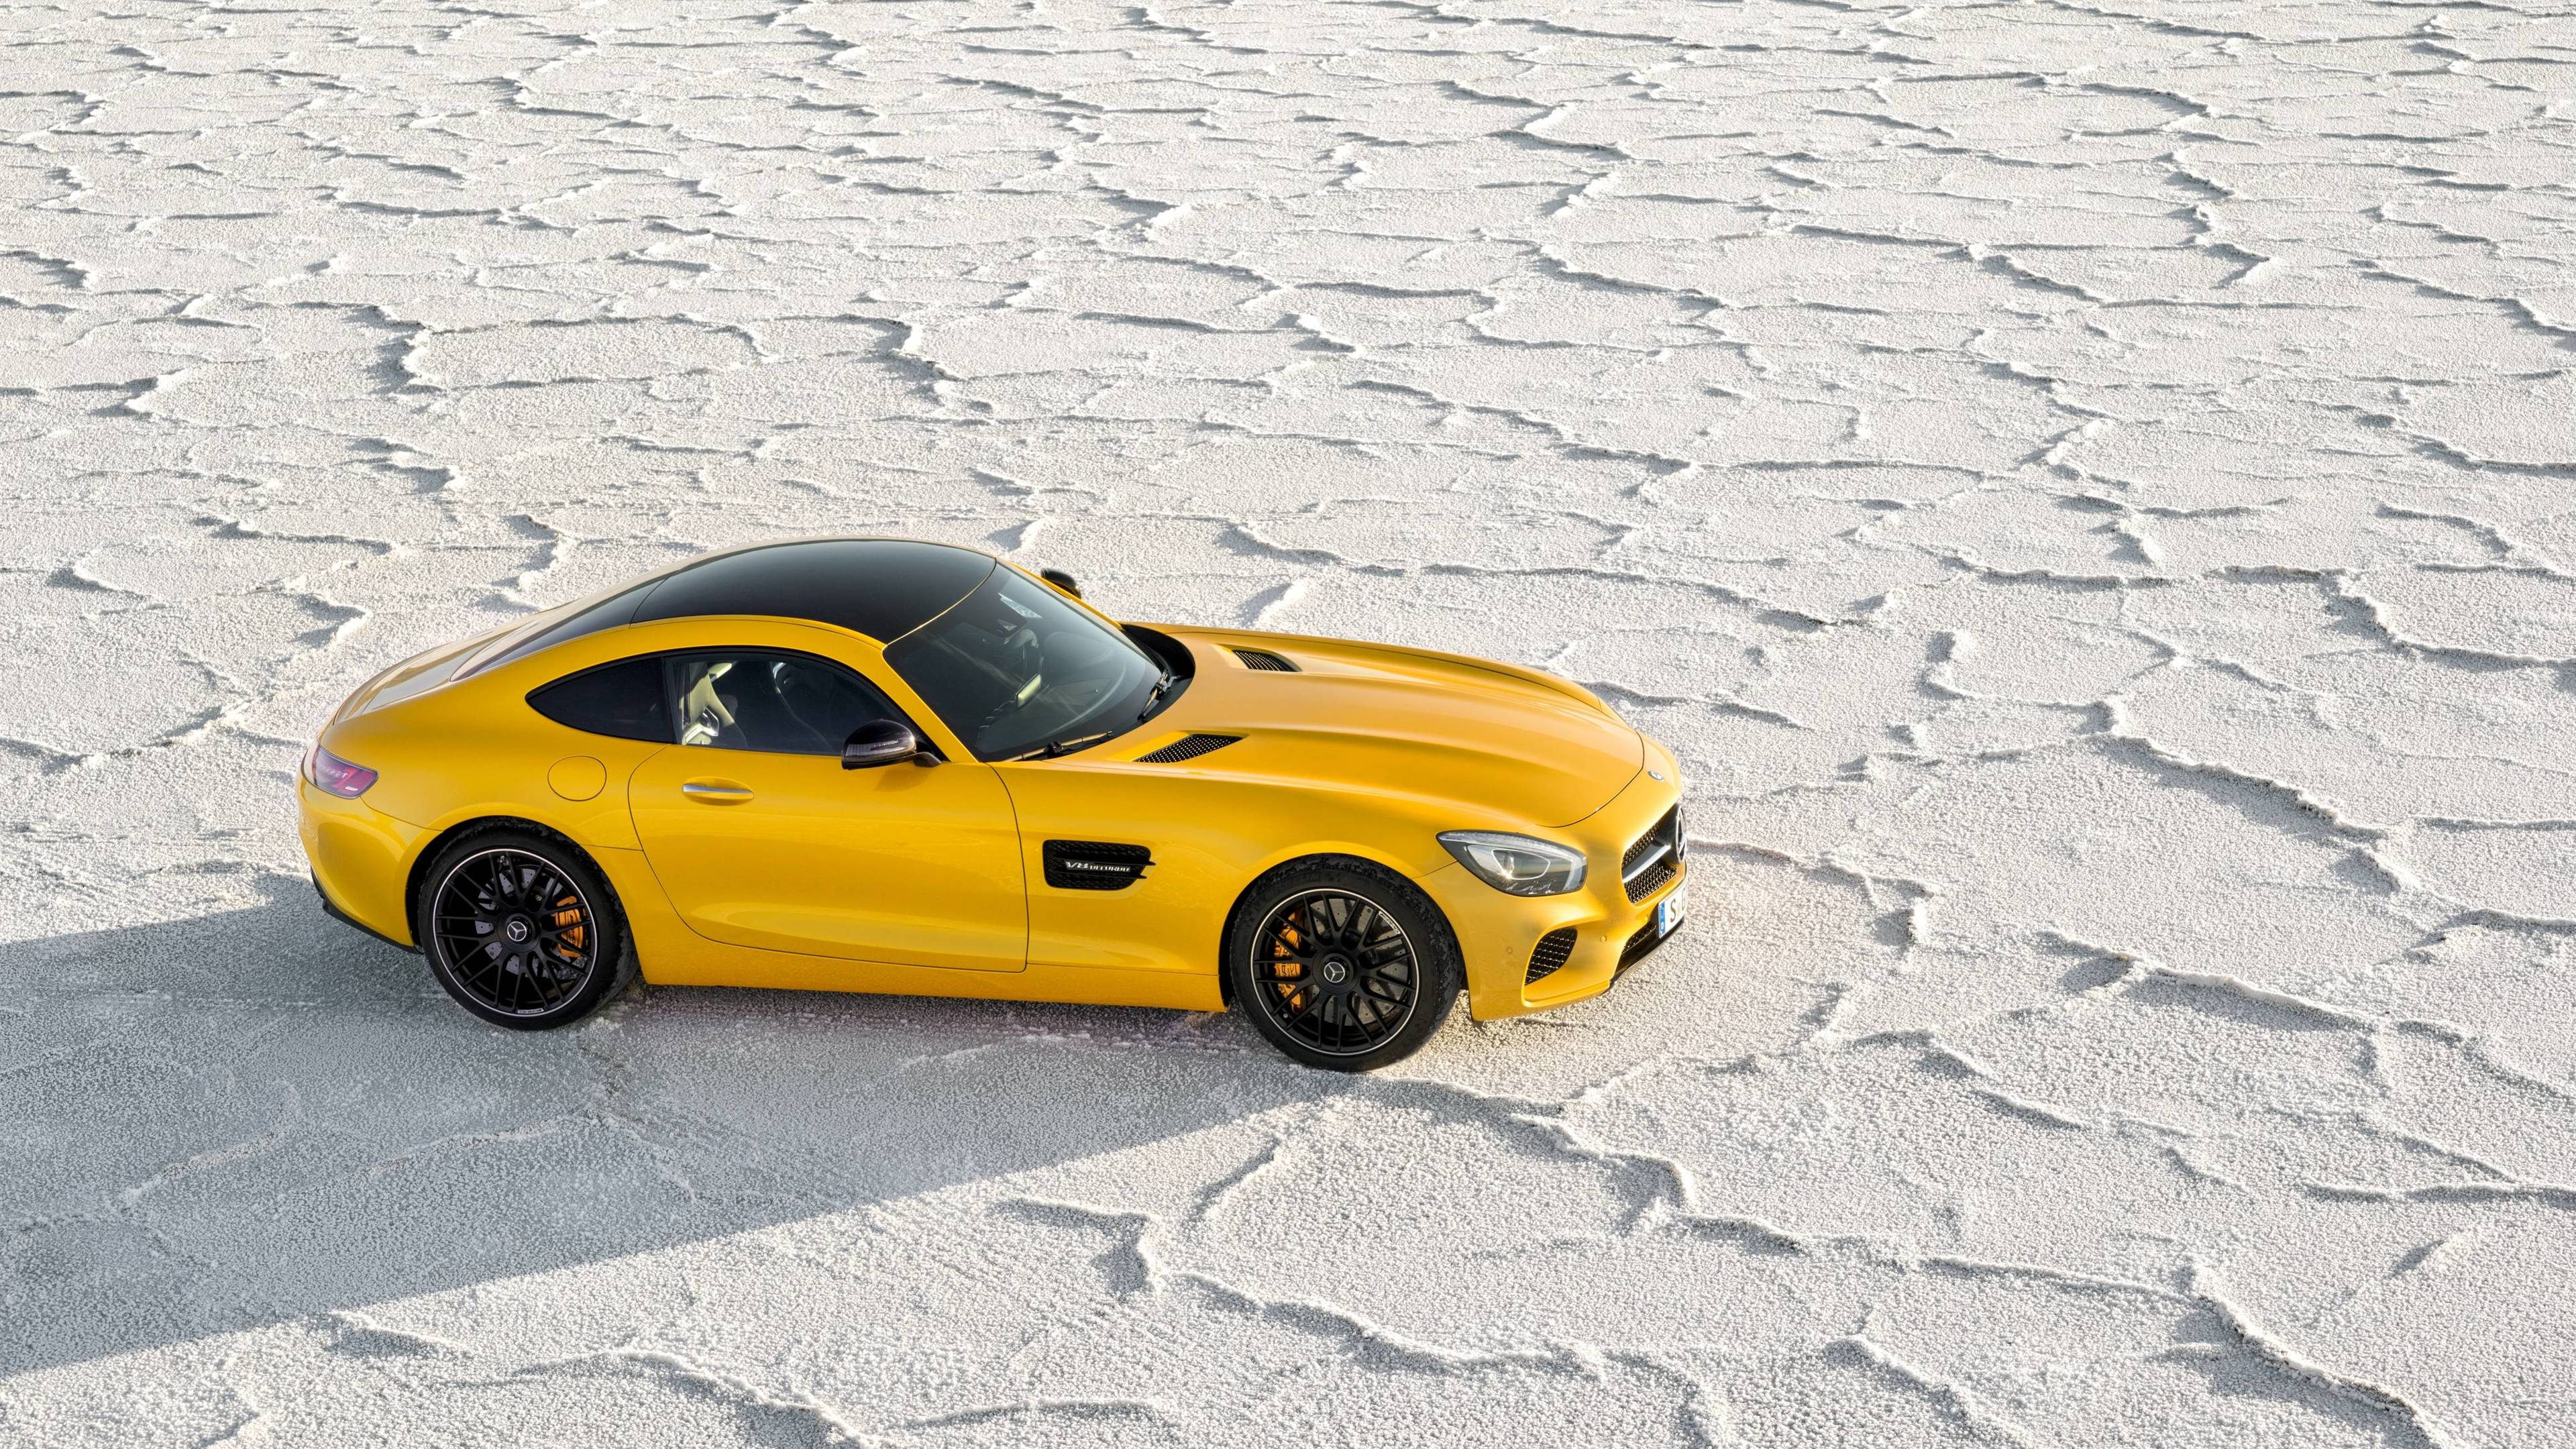 yellow mercedes benz amg gt 1539105073 - Yellow Mercedes Benz Amg GT - mercedes wallpapers, mercedes benz wallpapers, amg wallpapers, 2018 cars wallpapers